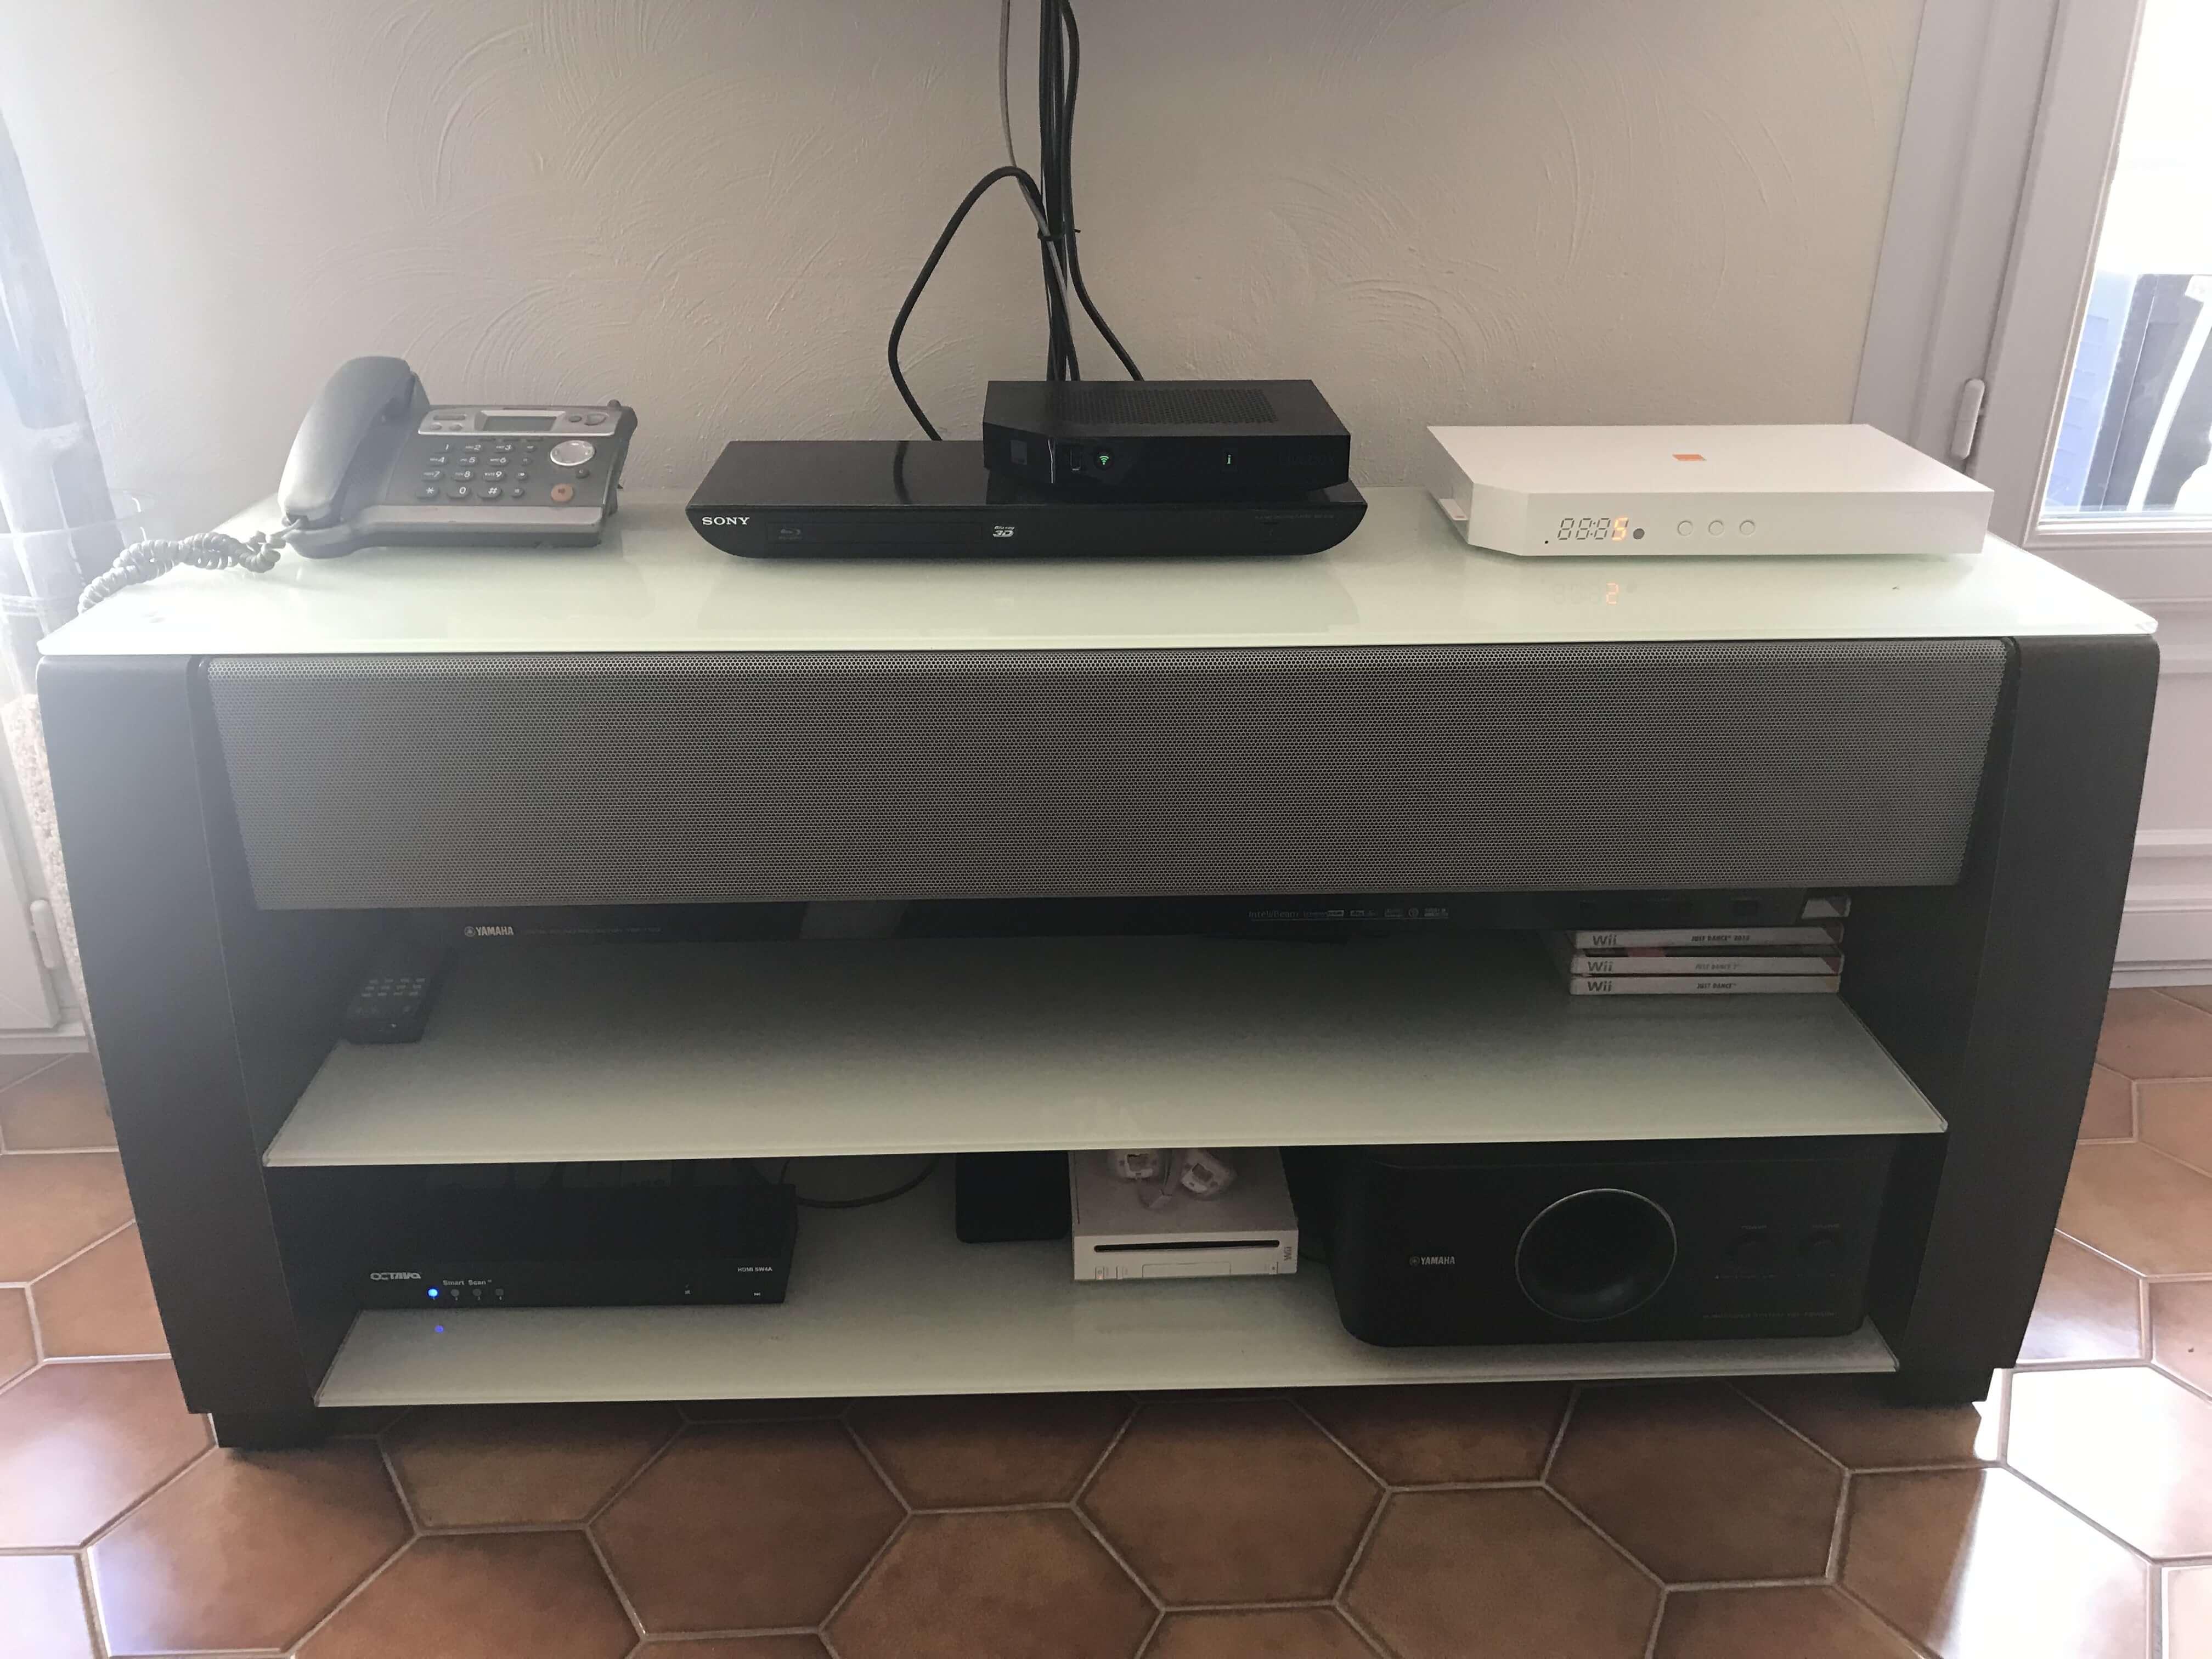 Meuble Tv Hifi Intégré meuble tv + barre de son yamaha ysp 1100 + caisson de grave